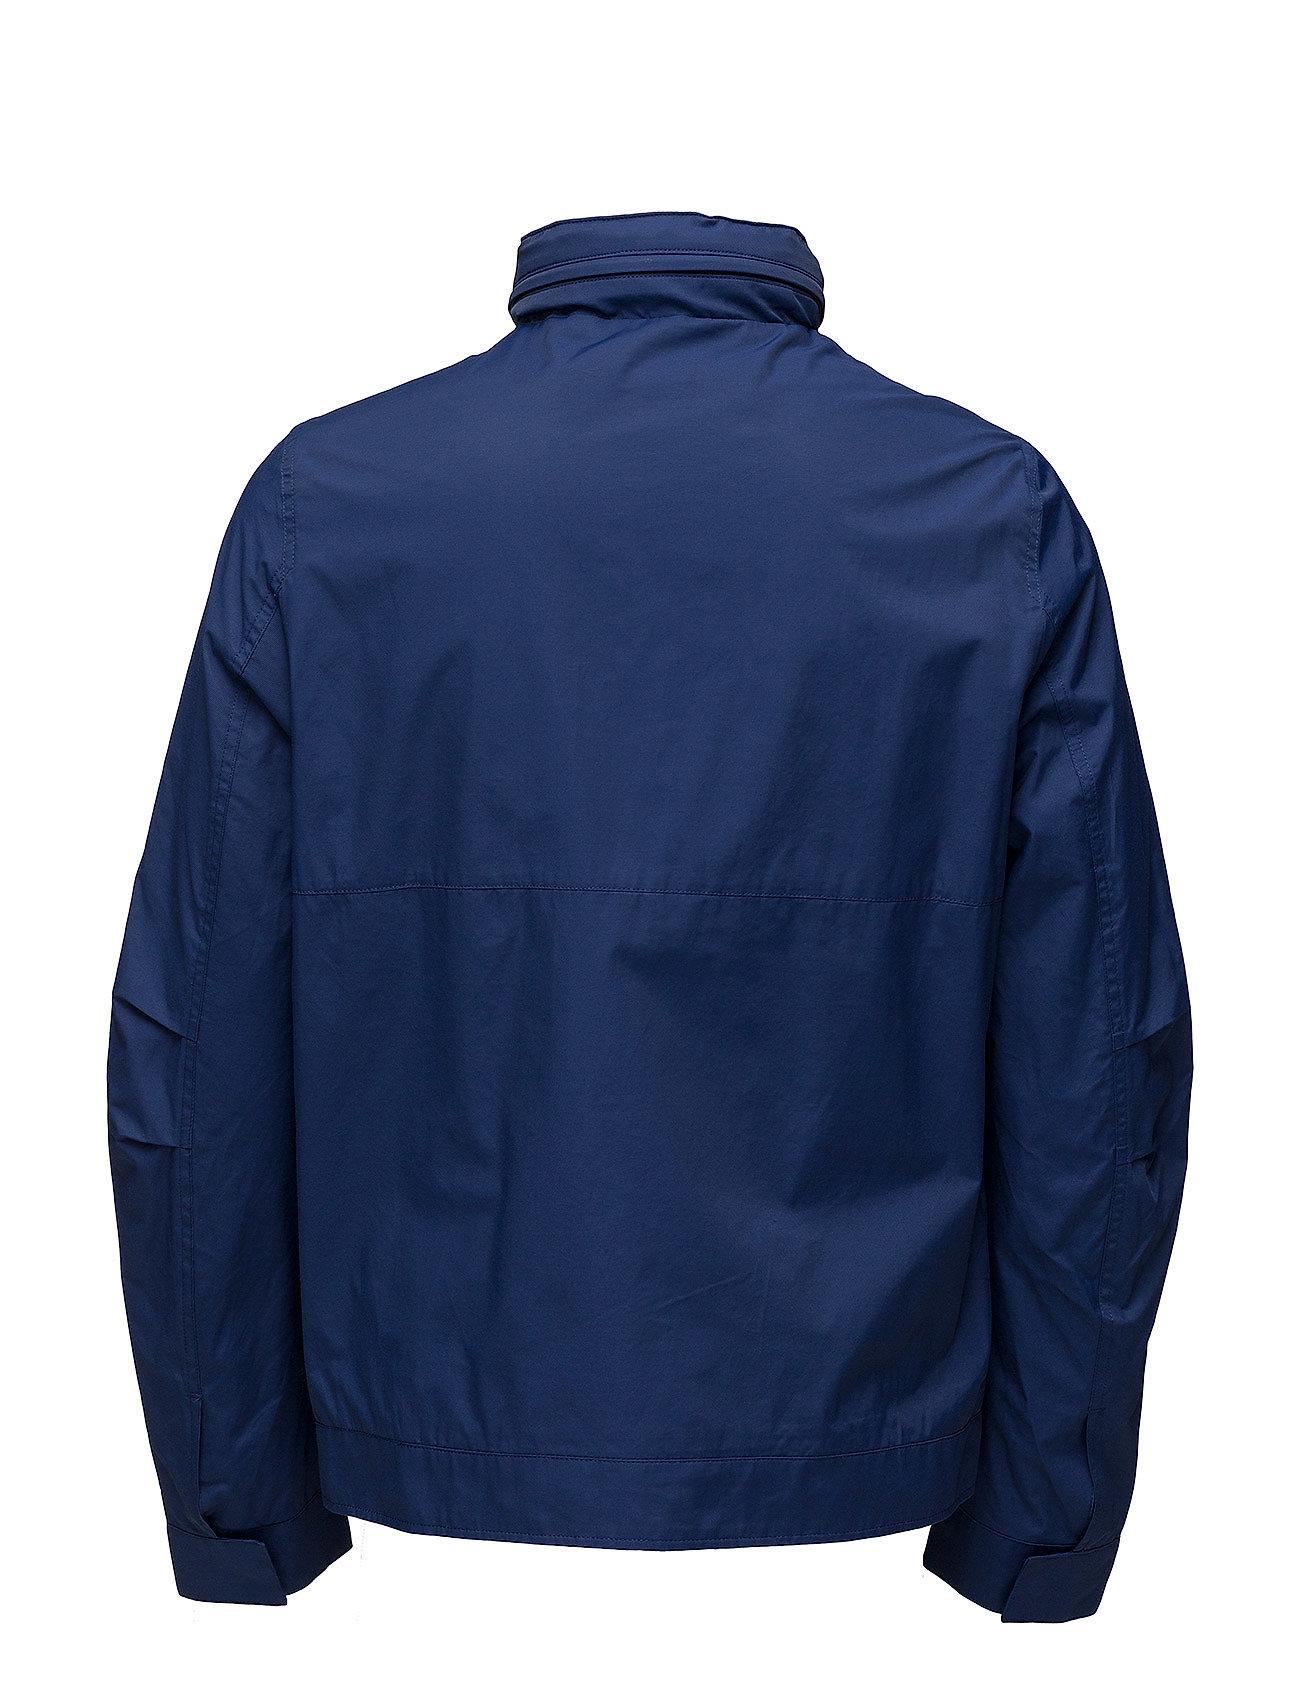 Logo Jacketblue Technical Jeans Hooded DepthsCalvin Klein SUMqpjLzGV